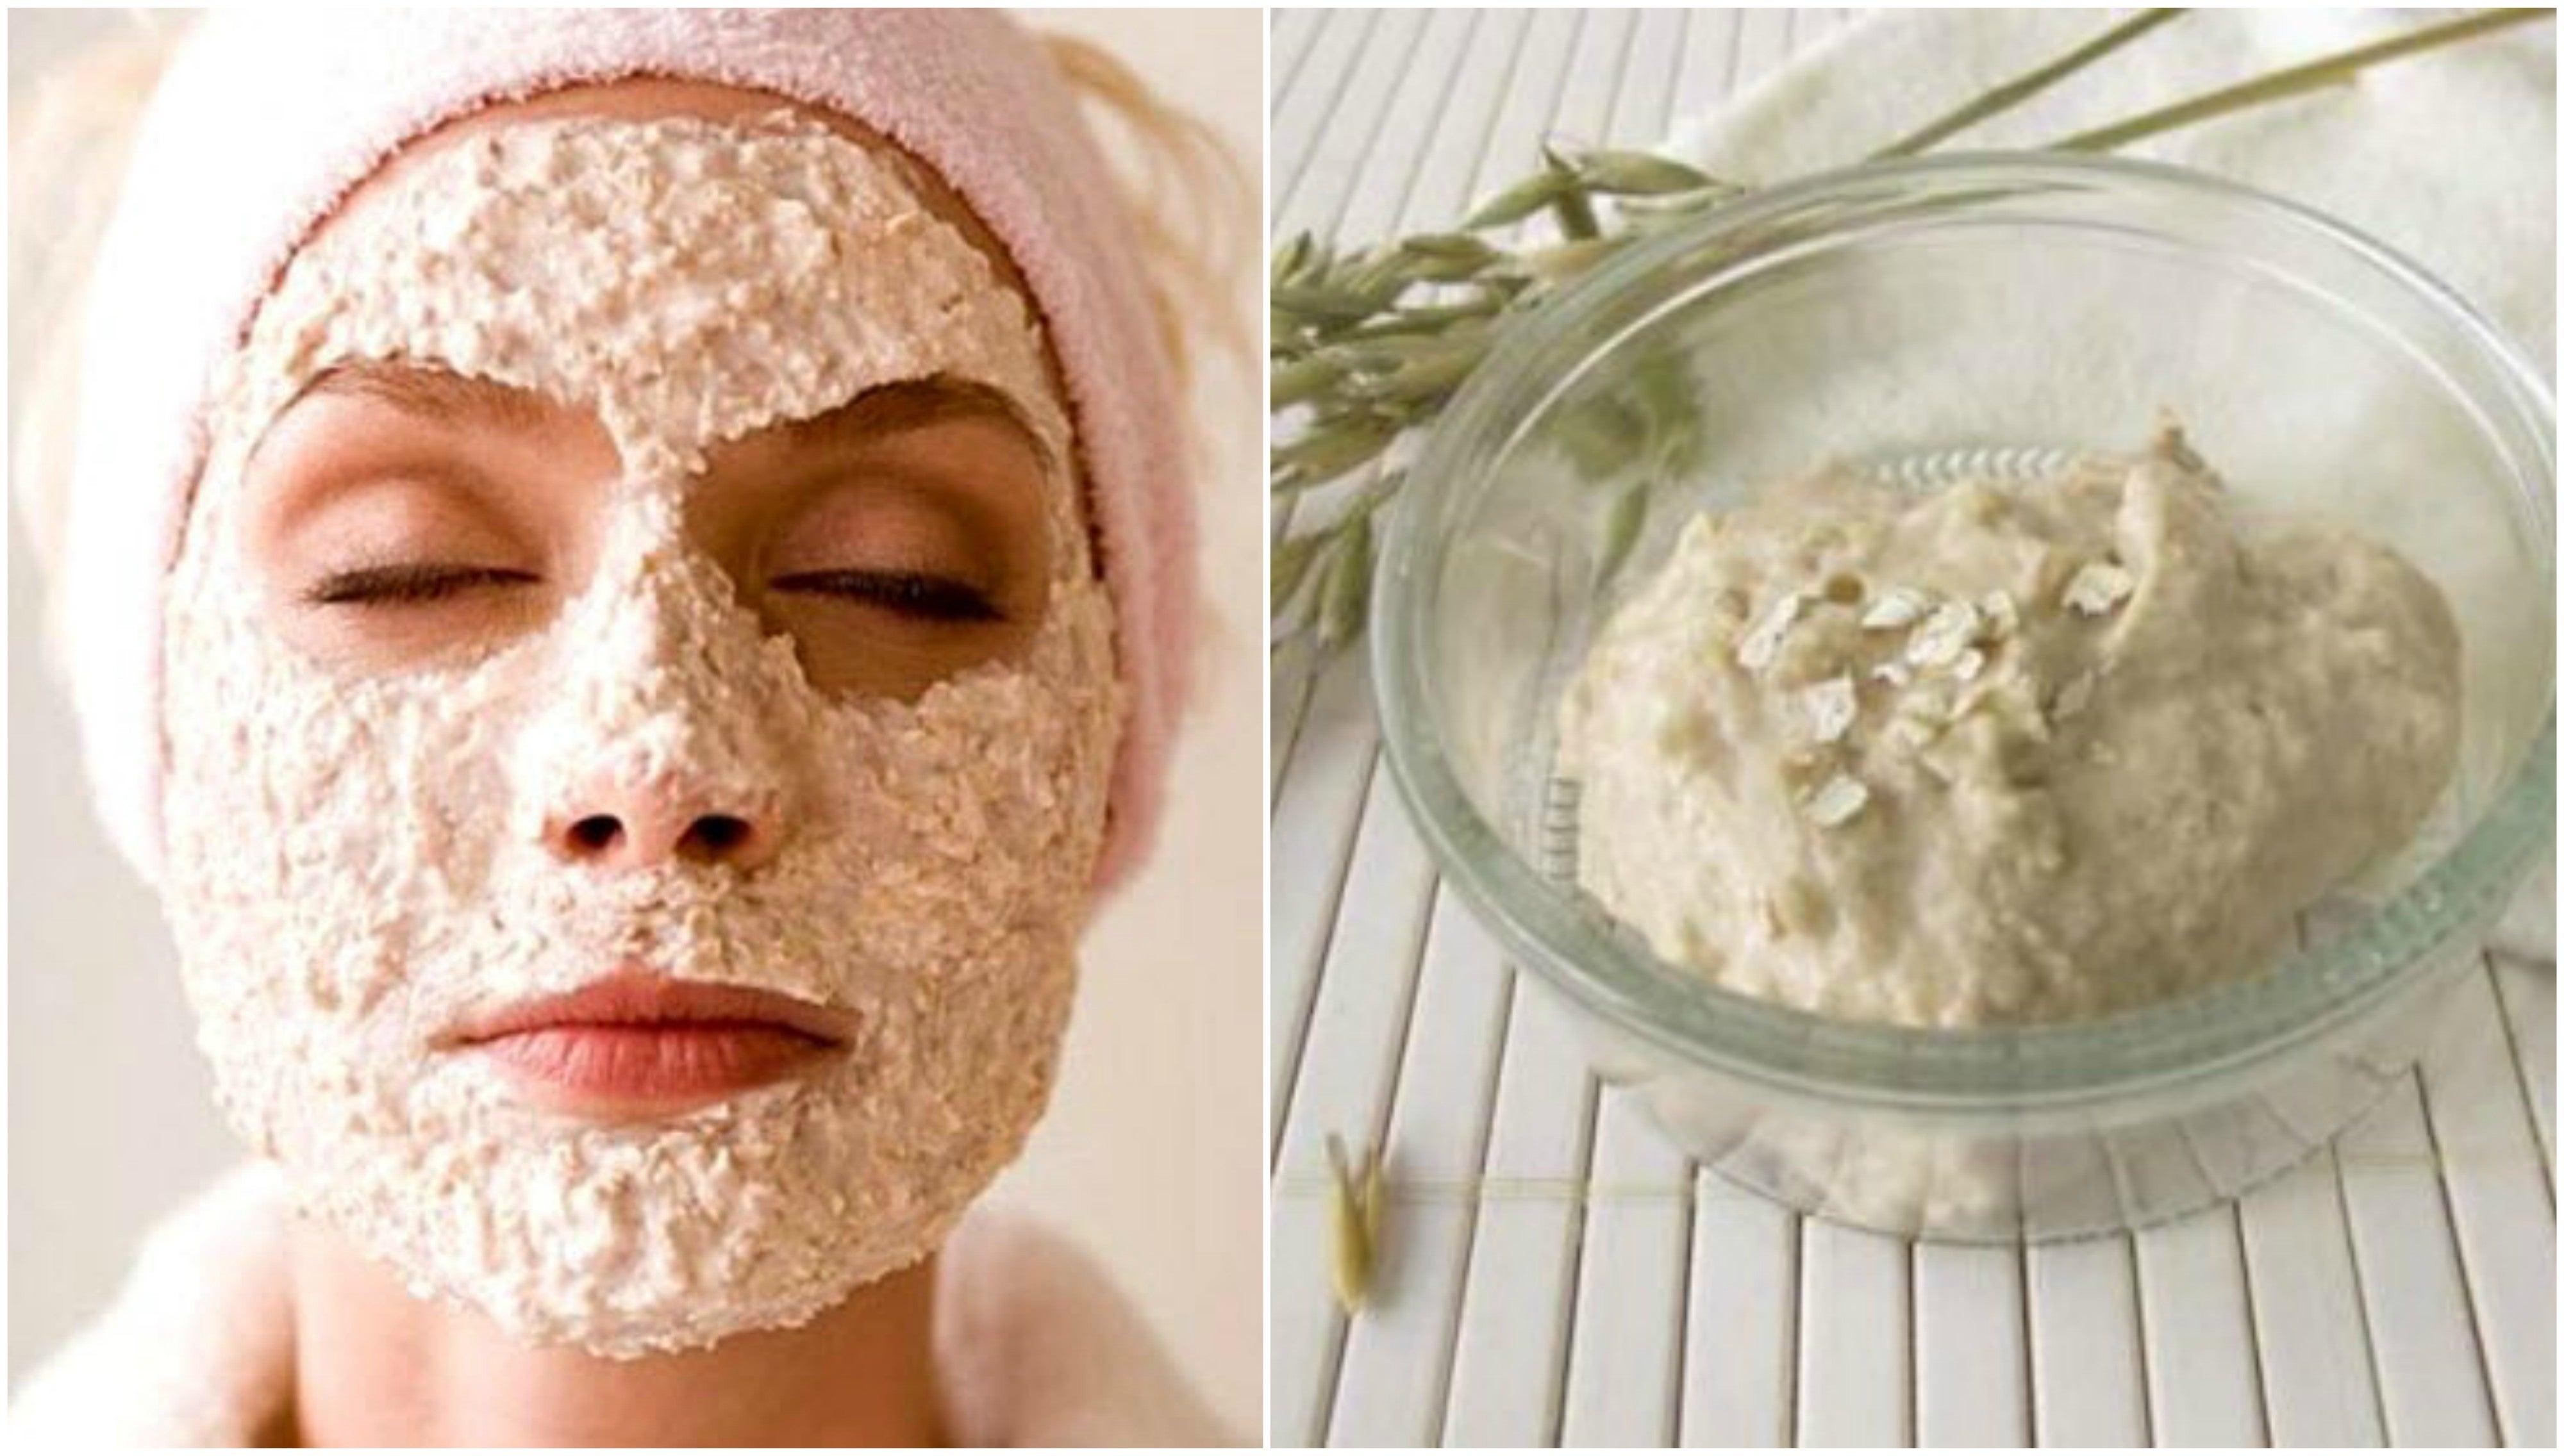 Iogurte e máscara de aveia para desintoxicar a pele do seu rosto